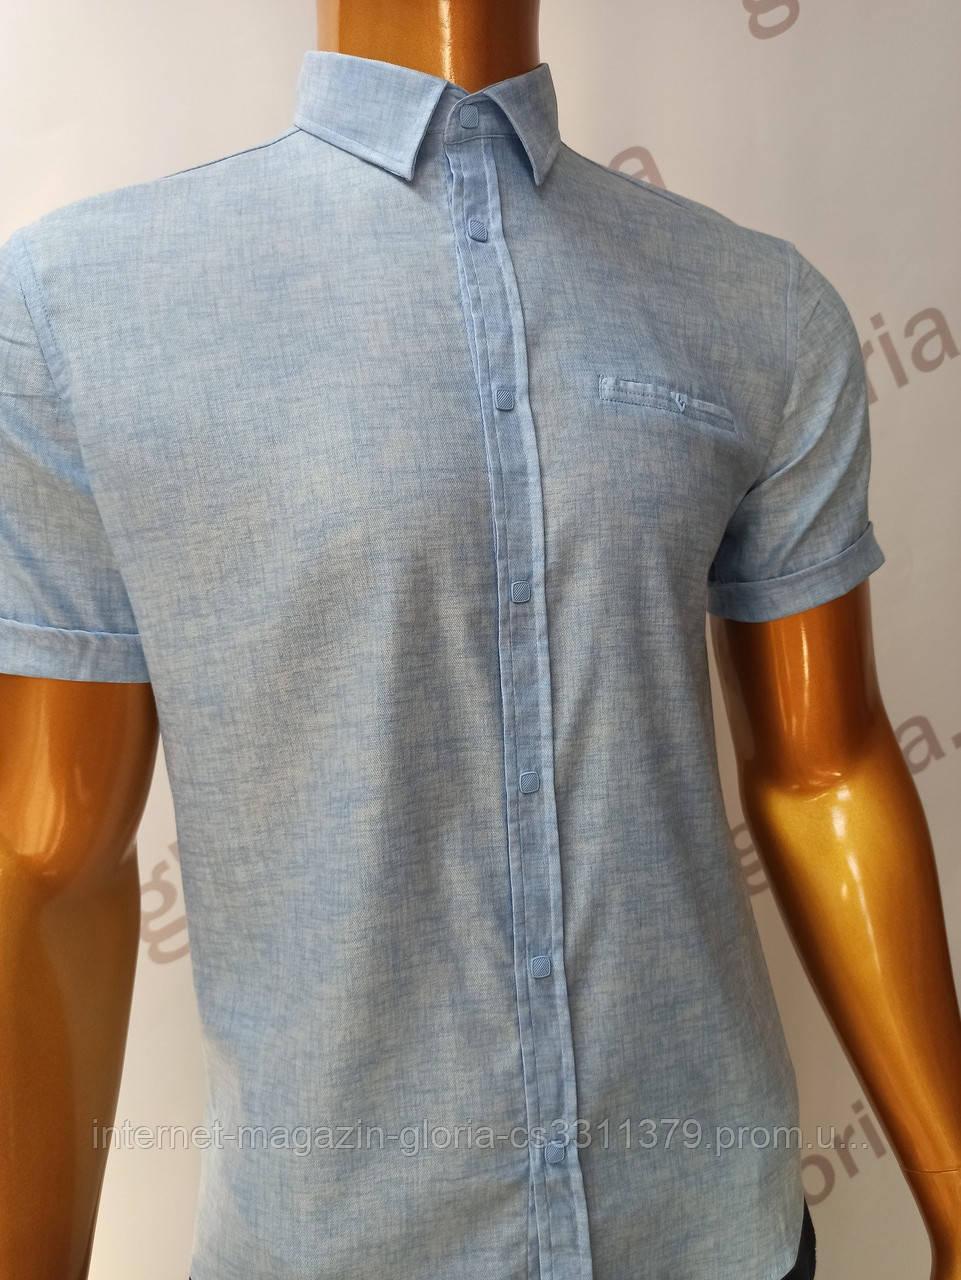 Мужская рубашка Amato. AG.19913(g). Размеры:L,XL(2), XXL.